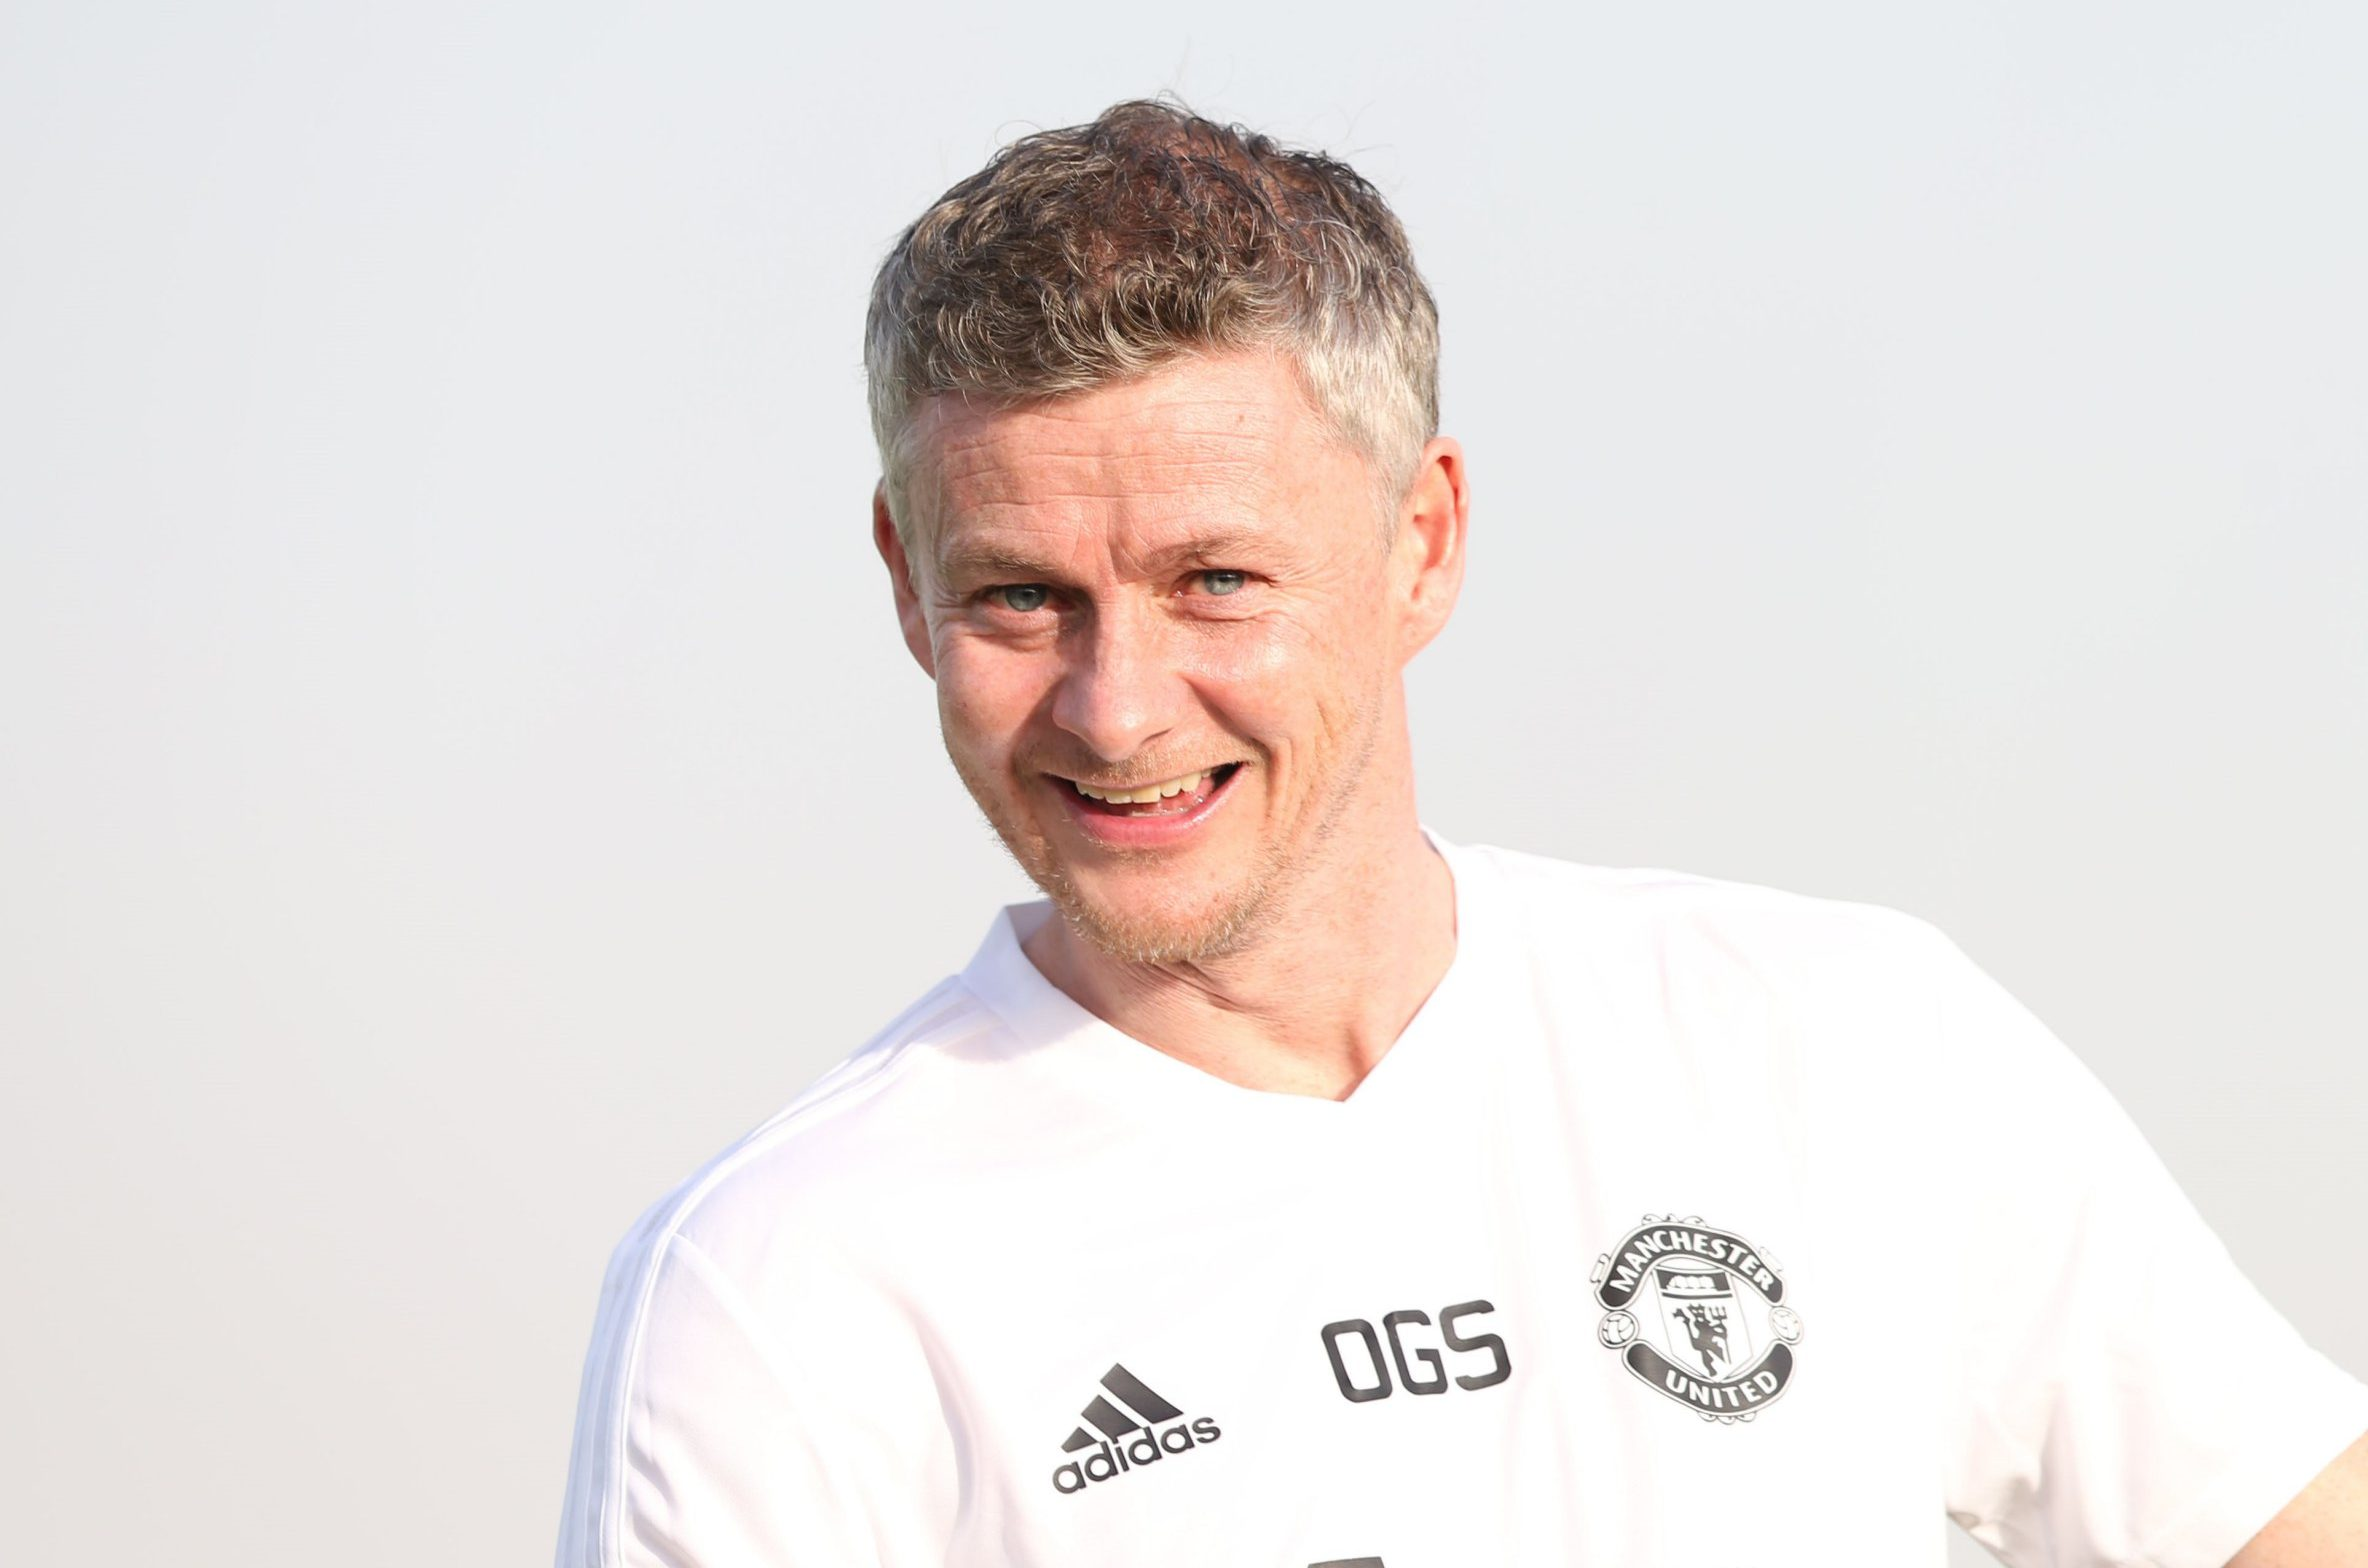 Solskjaer shakes hands with Ed Woodward on Manchester United job over dinner